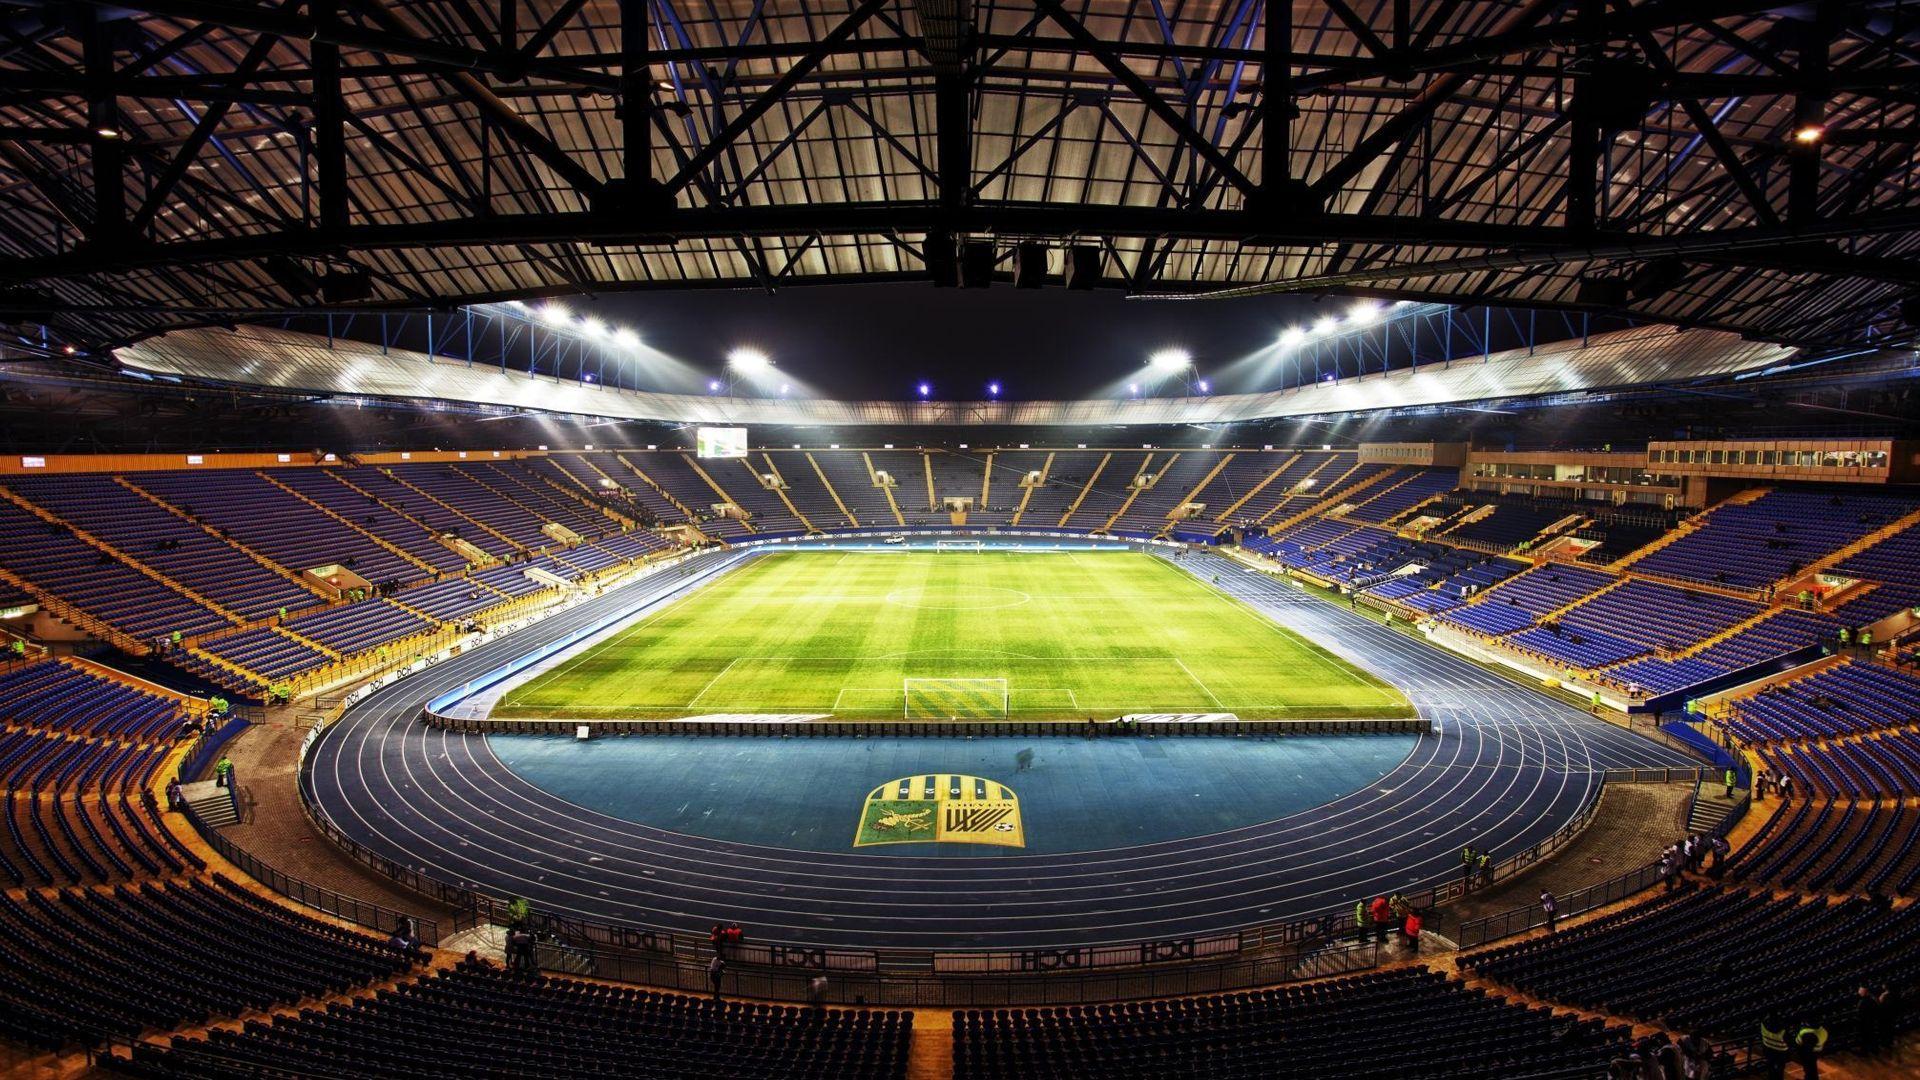 Descargarfondosdepantalla On Twitter Stadium Wallpaper World Cup Stadiums Sports Wallpapers